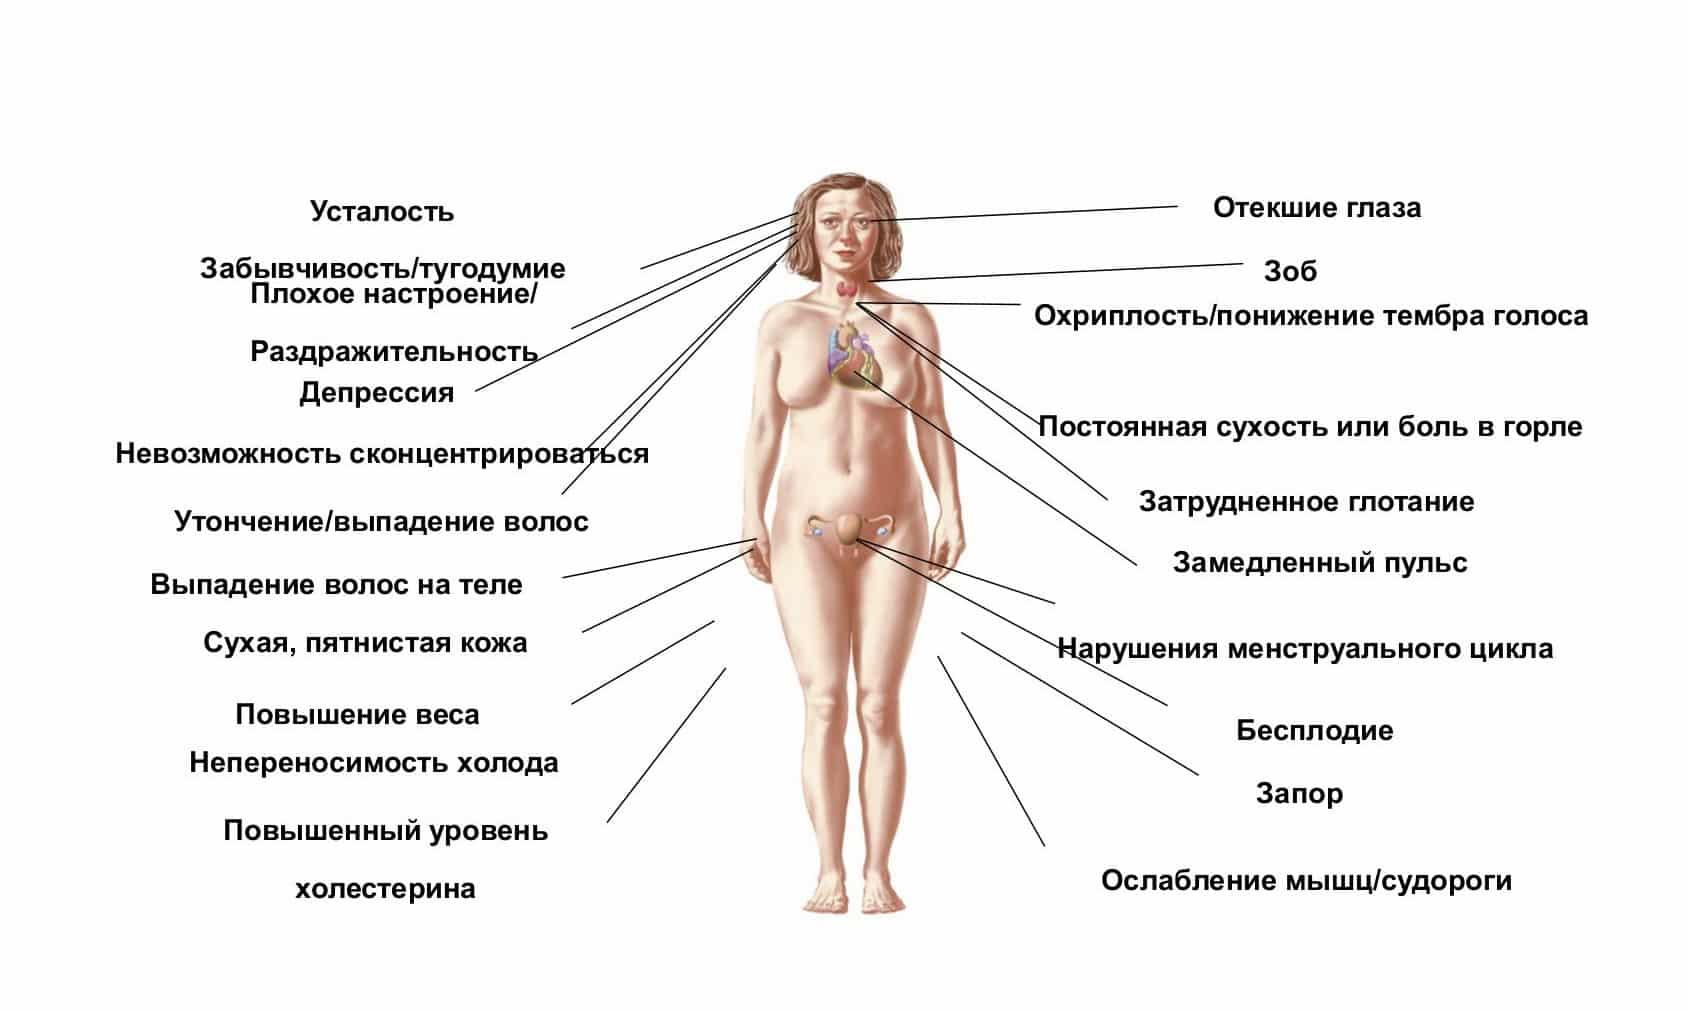 гипо и гипертиреоз картинки данной